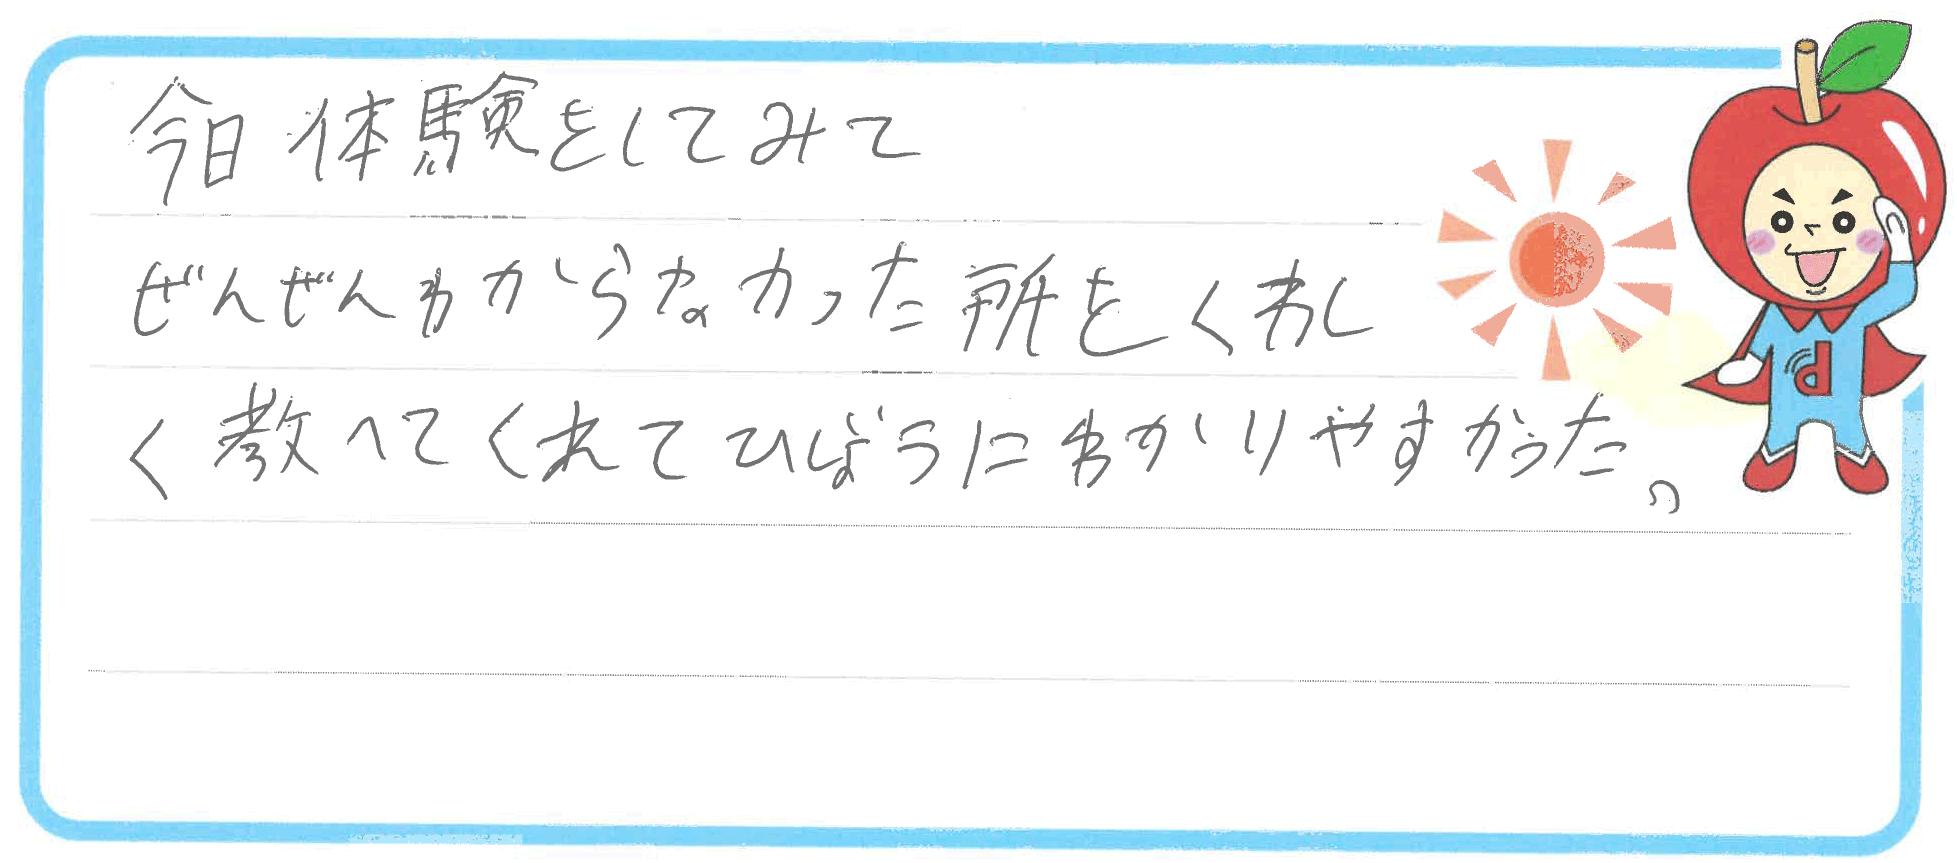 K君(出雲市)からの口コミ